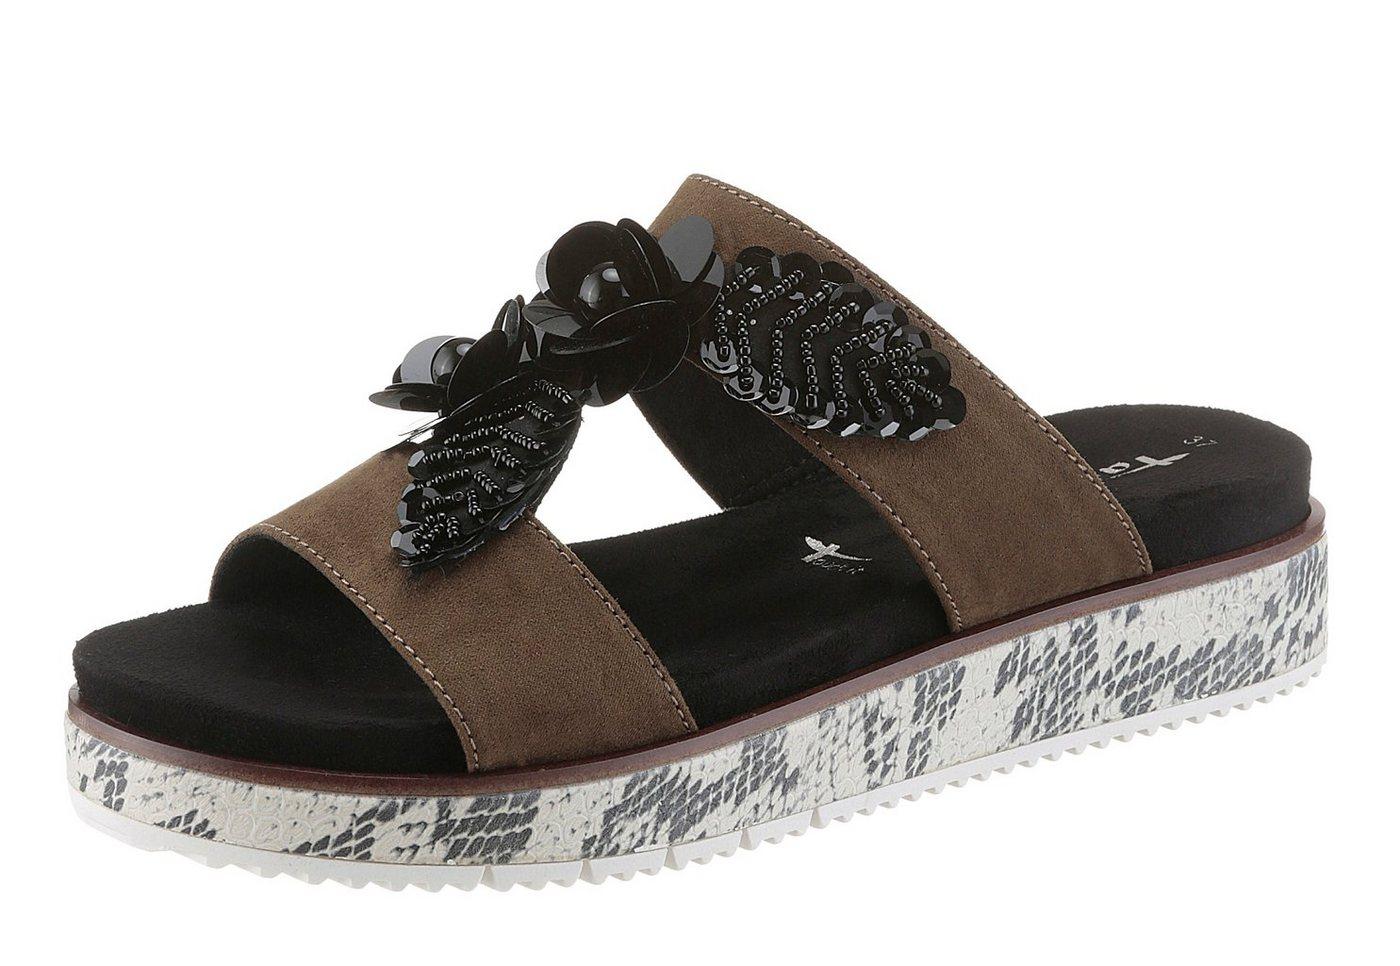 TAMARIS slippers thumbnail